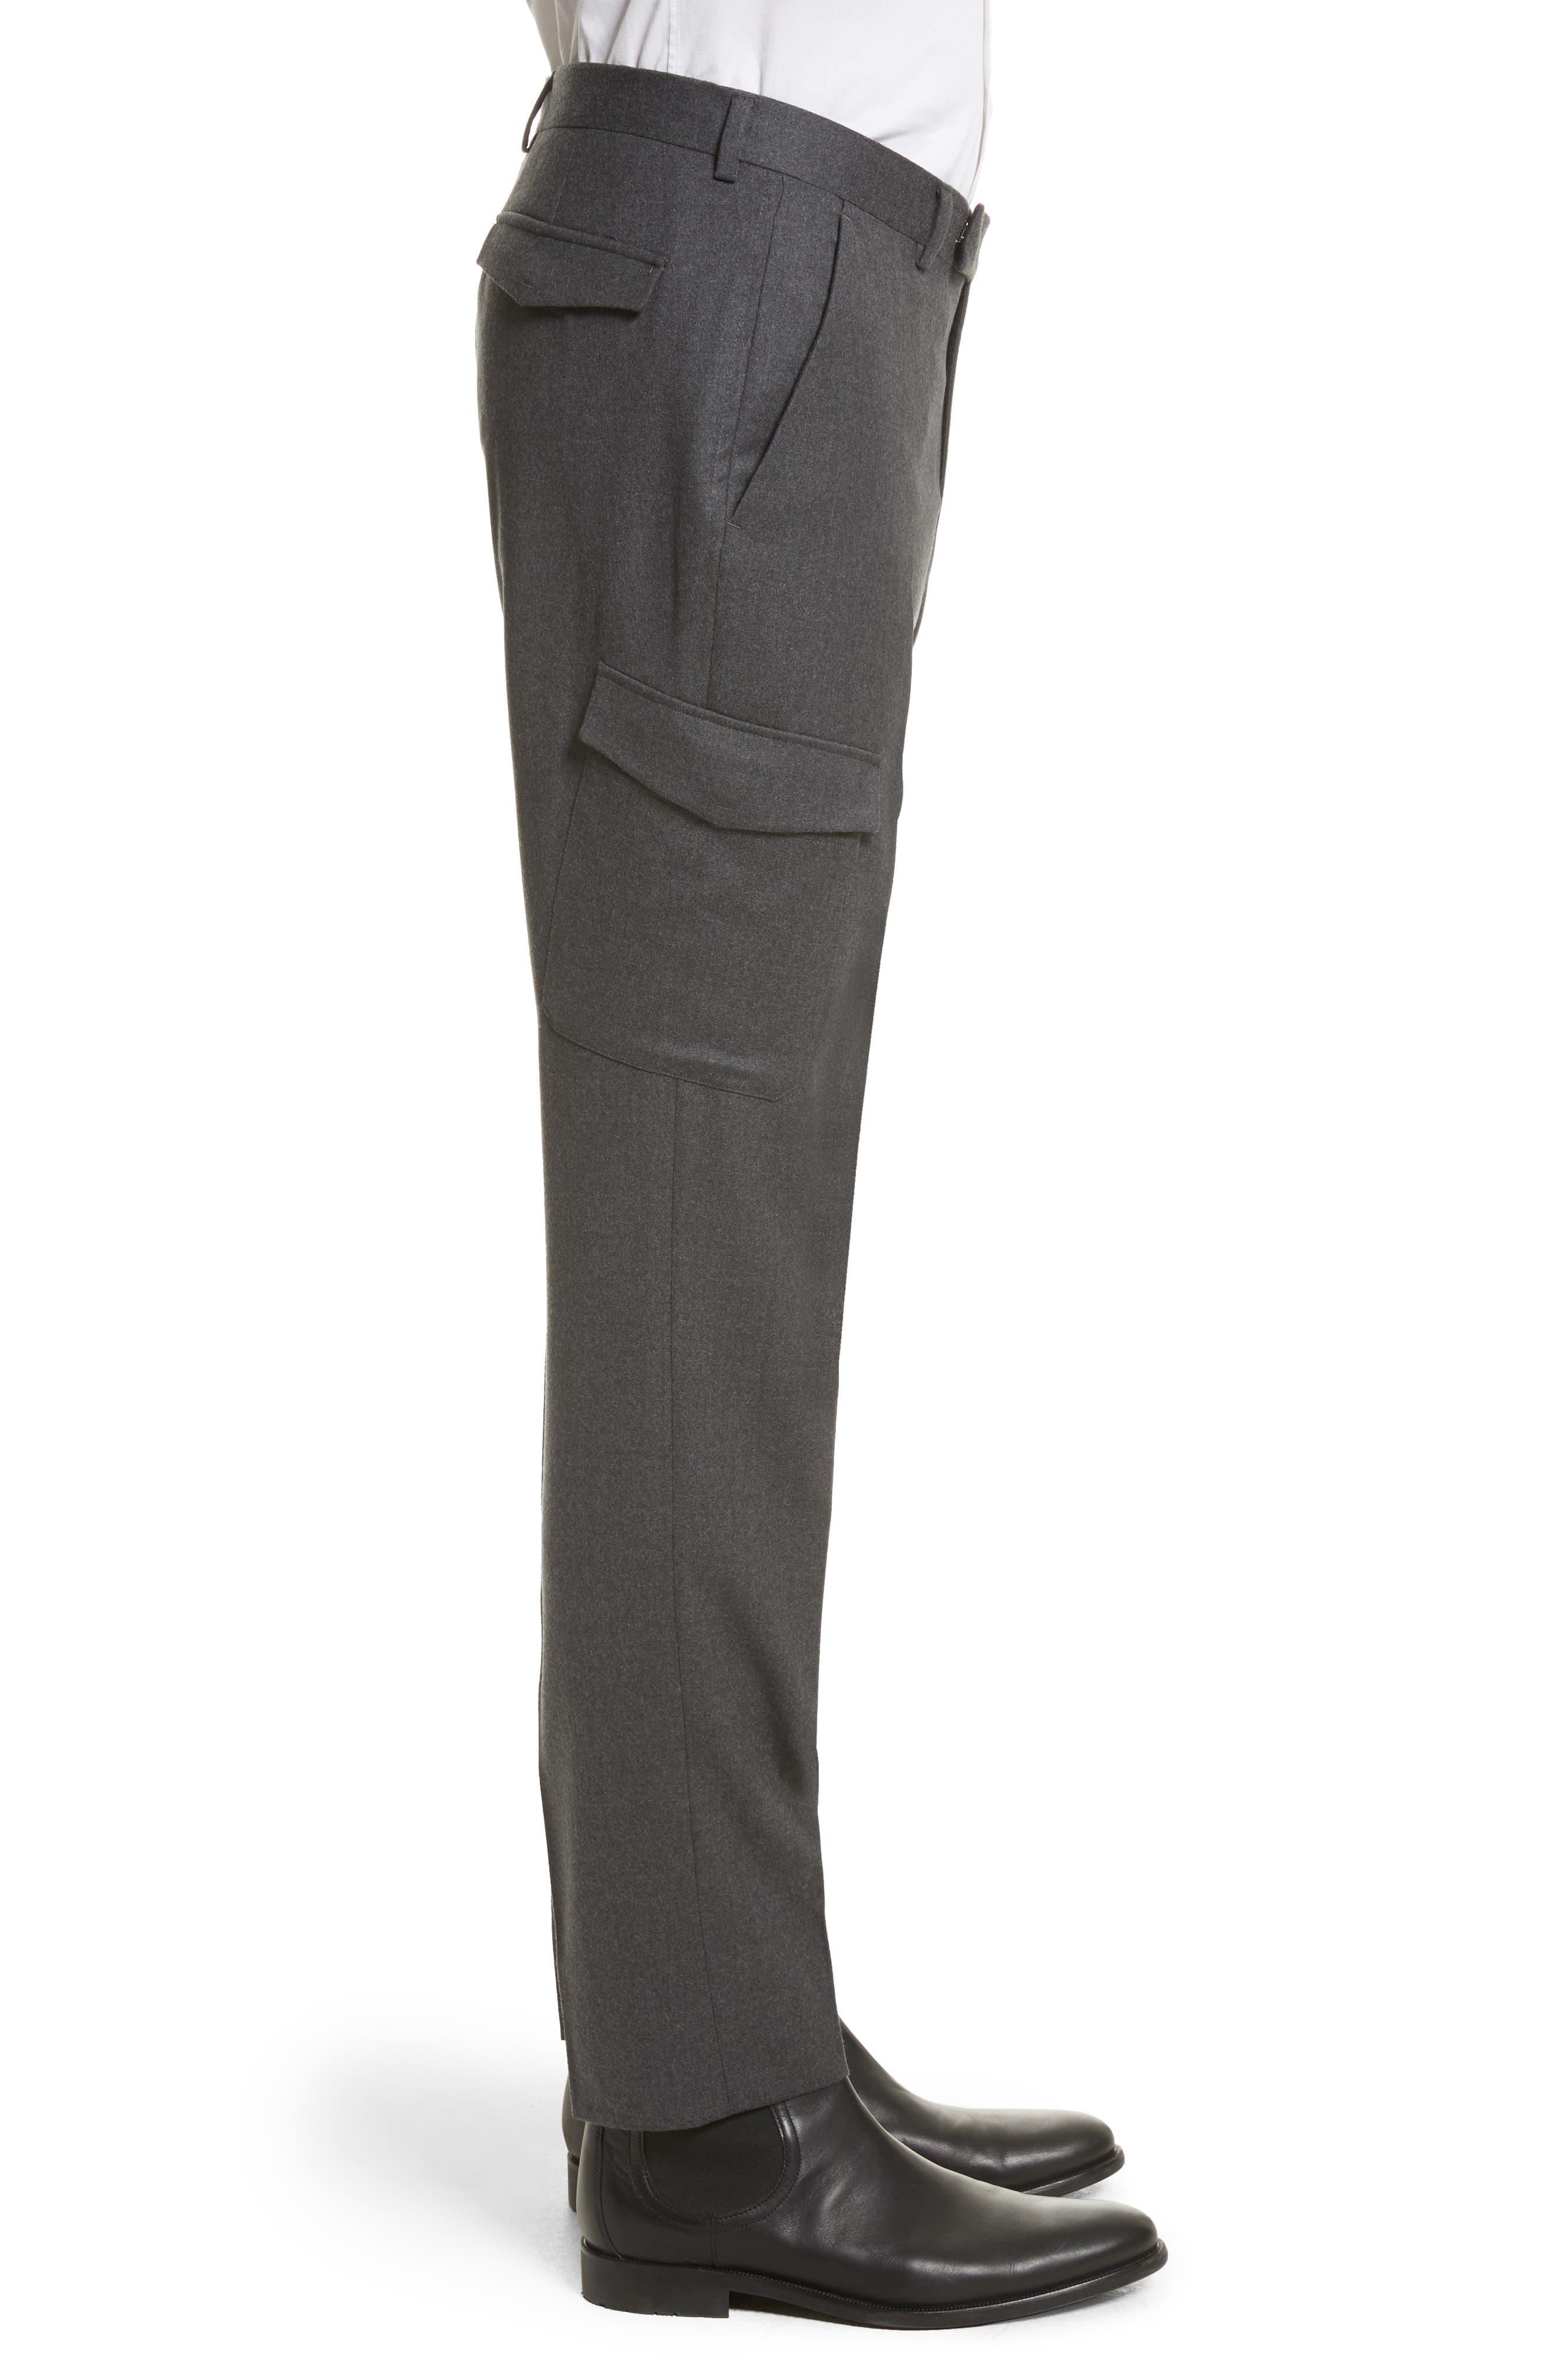 Regular Fit Wool Cargo Trousers,                             Alternate thumbnail 3, color,                             Dark Grey Solid